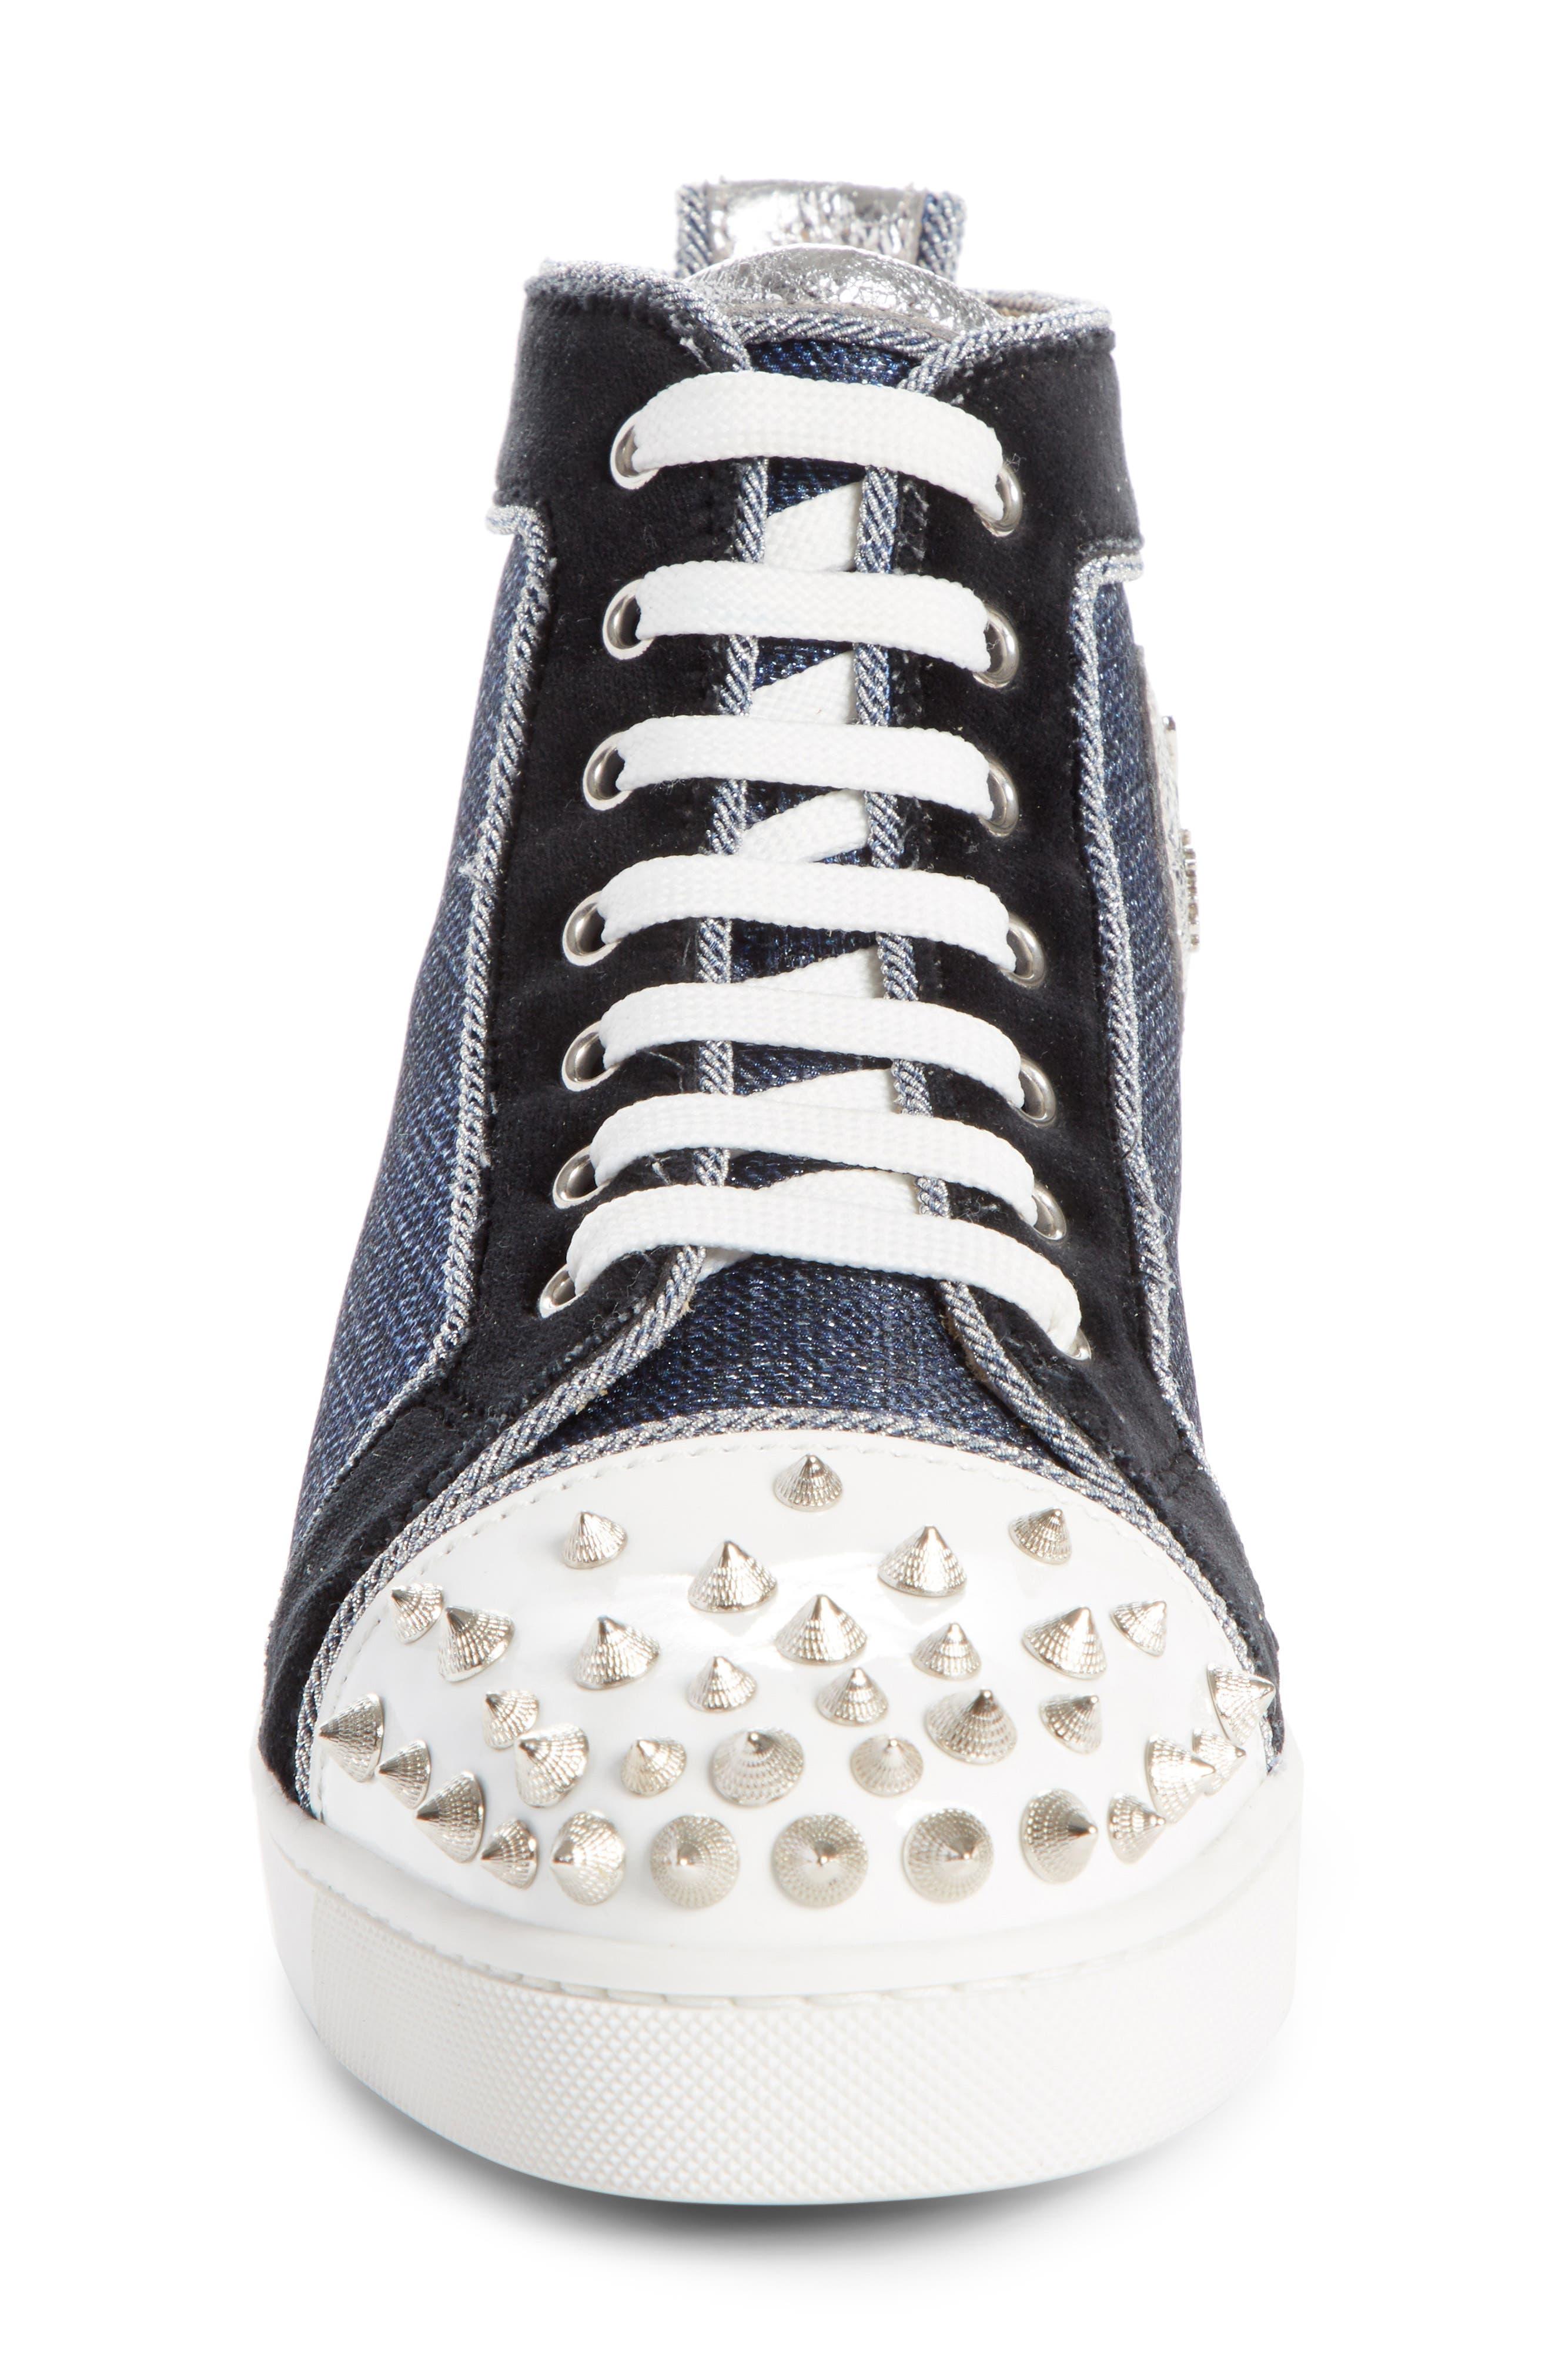 Lou Degra Spiked High Top Sneaker,                             Alternate thumbnail 4, color,                             Denim/ Silver